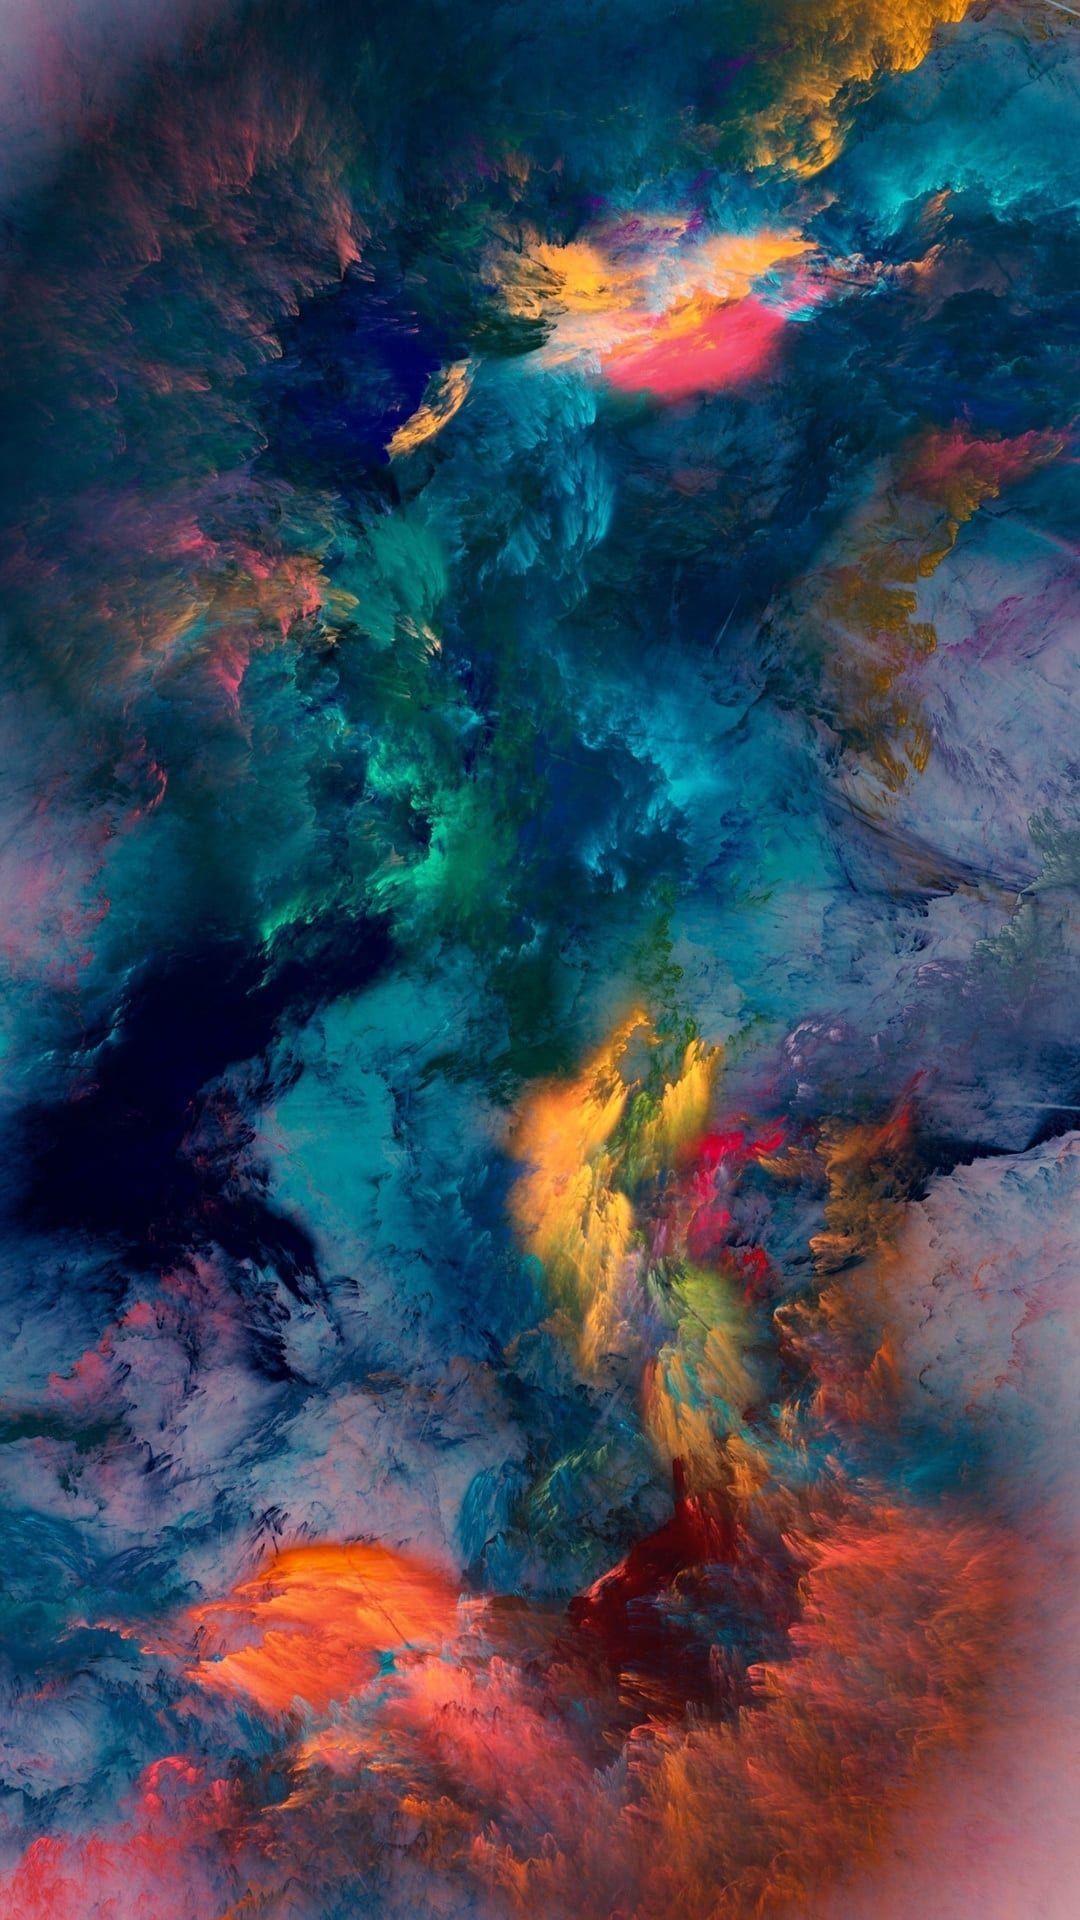 Download Storm Wallpaper Hd Wallpaper Iphone Iphone 7 Plus Wallpaper